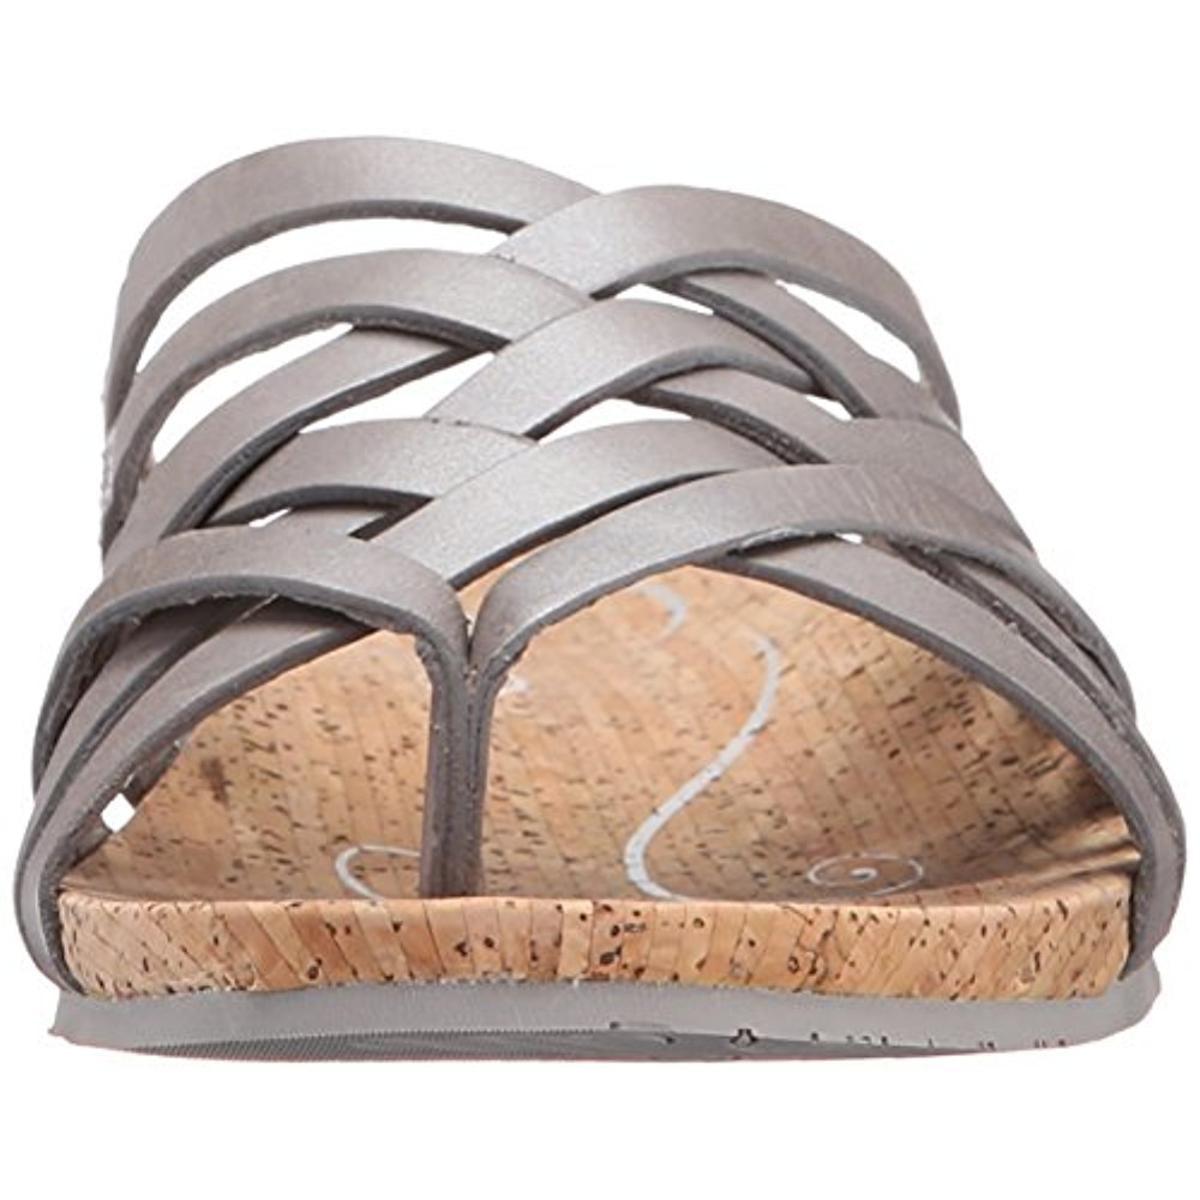 7ae91fee61e Ahnu - Ahnu Womens Maia Leather Crossover Thong Sandals - Walmart.com